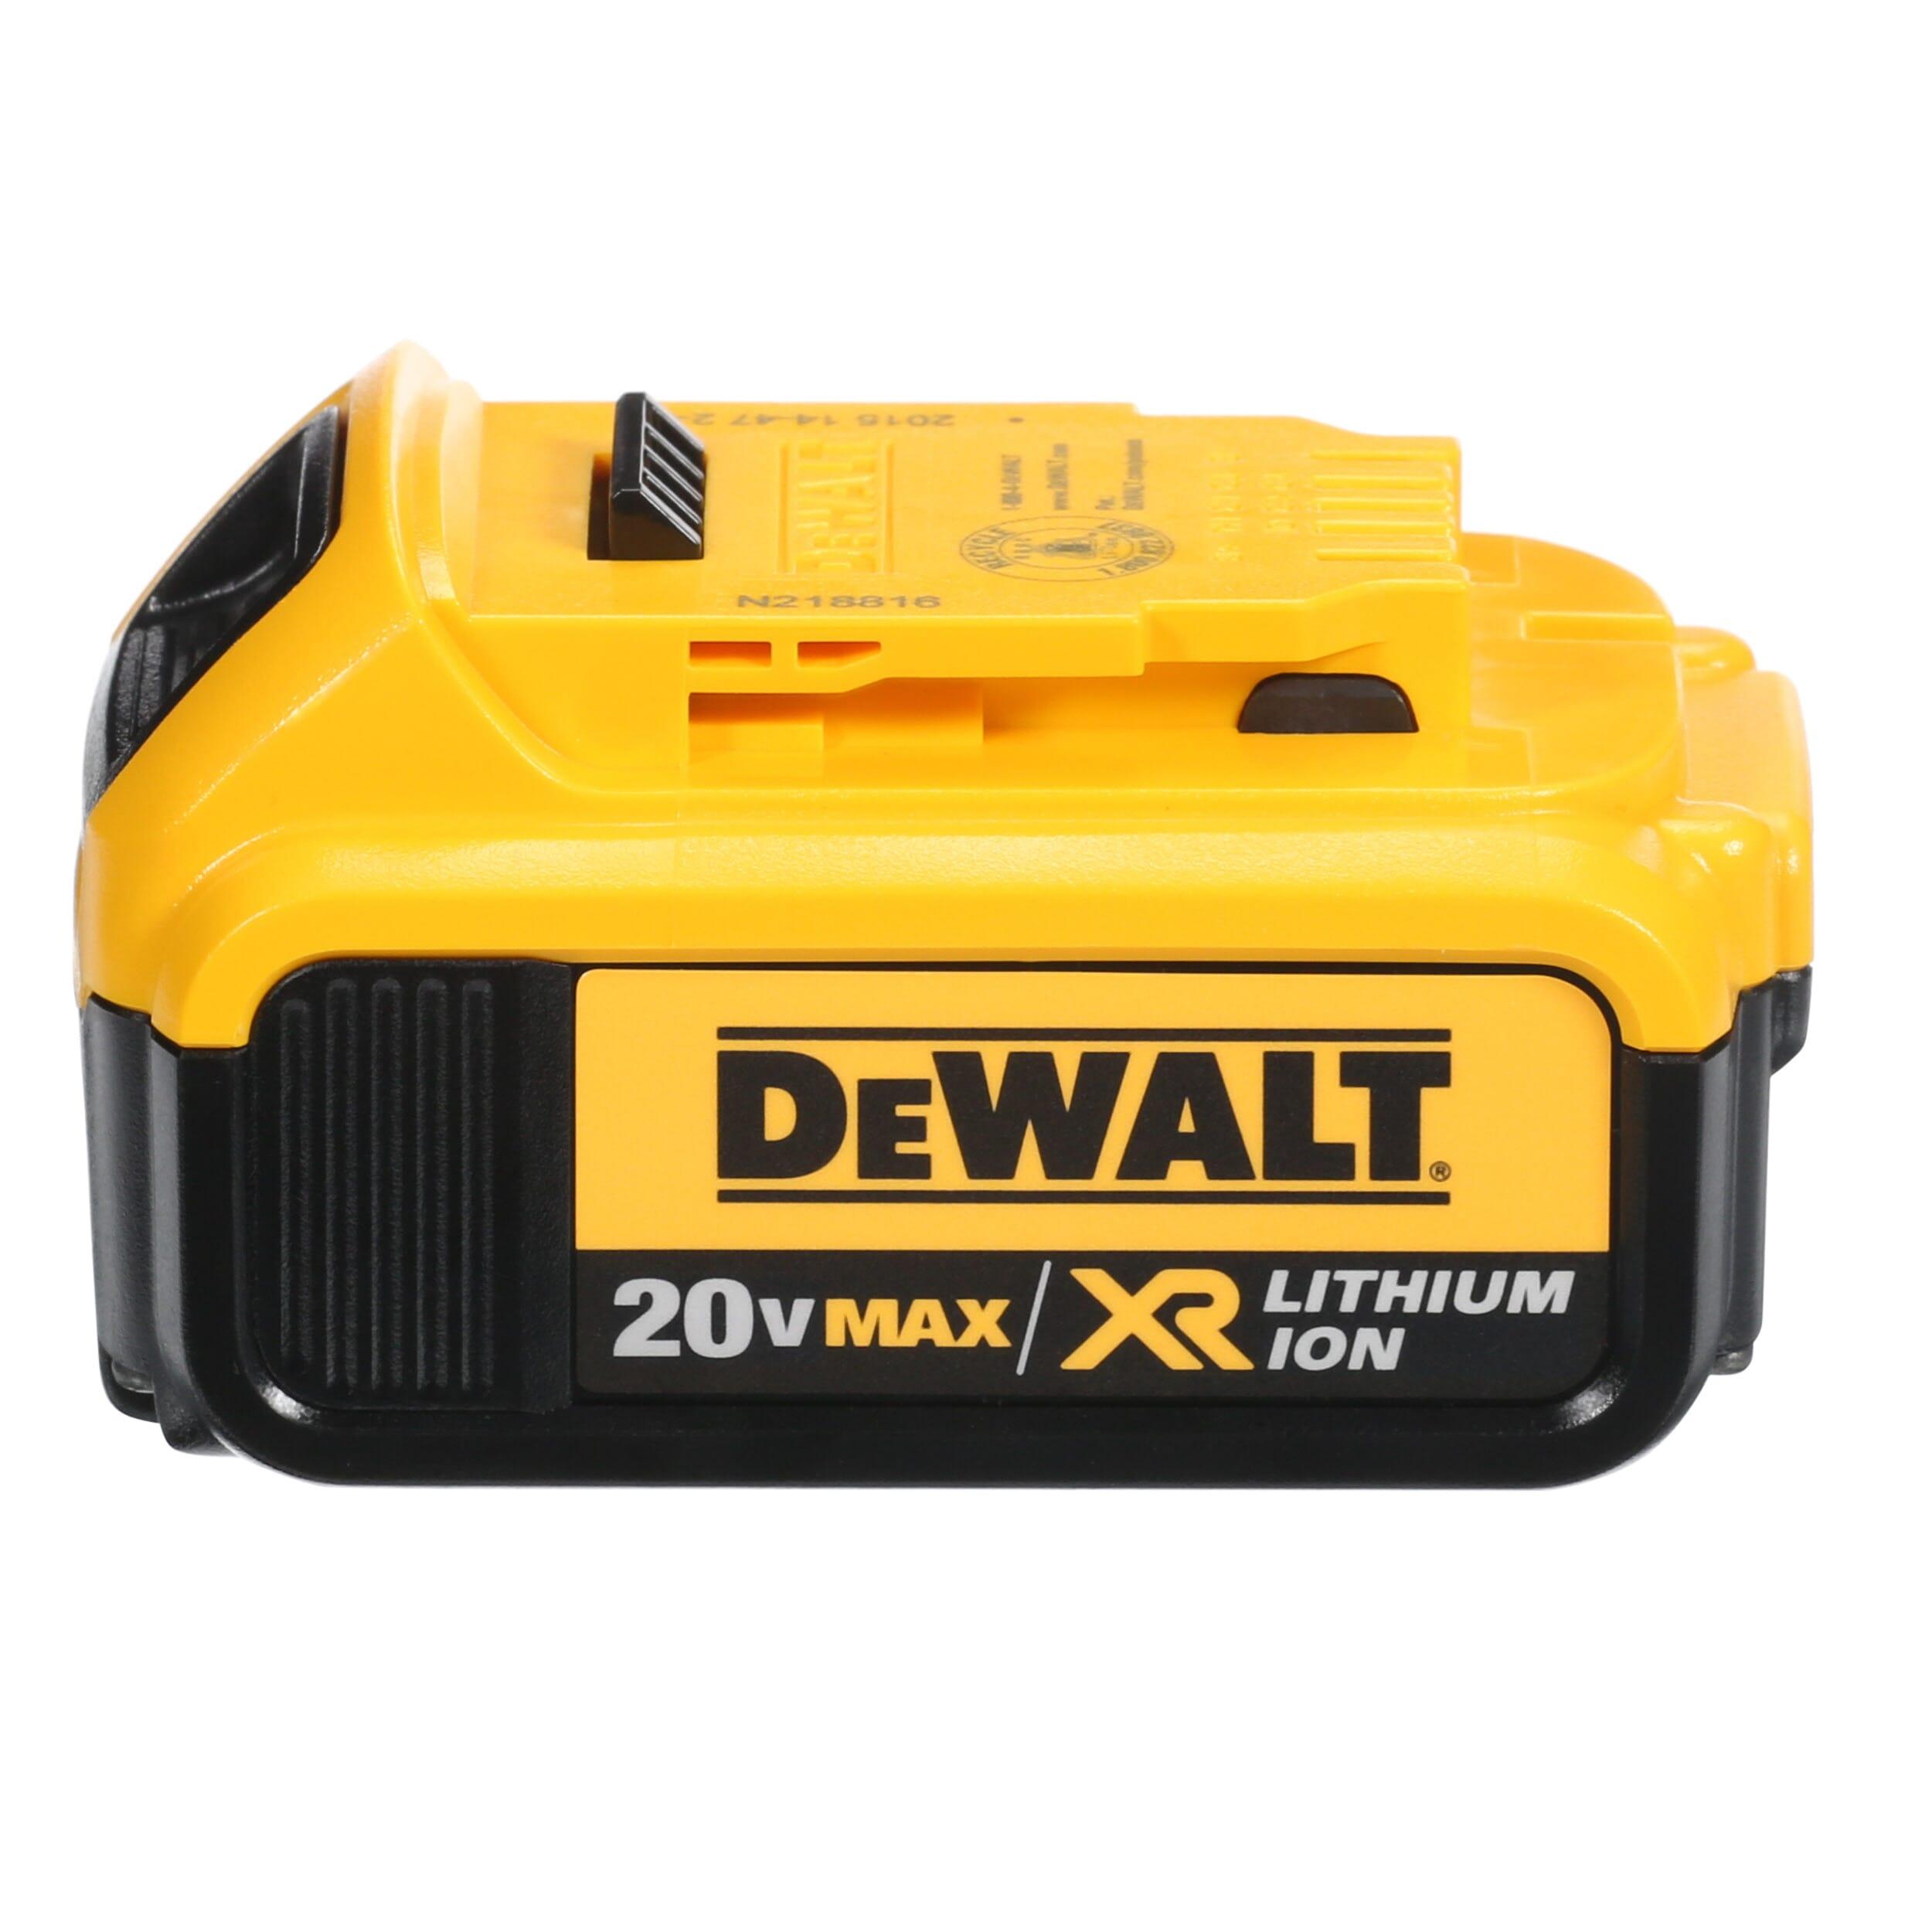 DEWALT 20-Volt MAX XR Lithium-Ion Premium Battery Pack 4.0Ah (2 ...